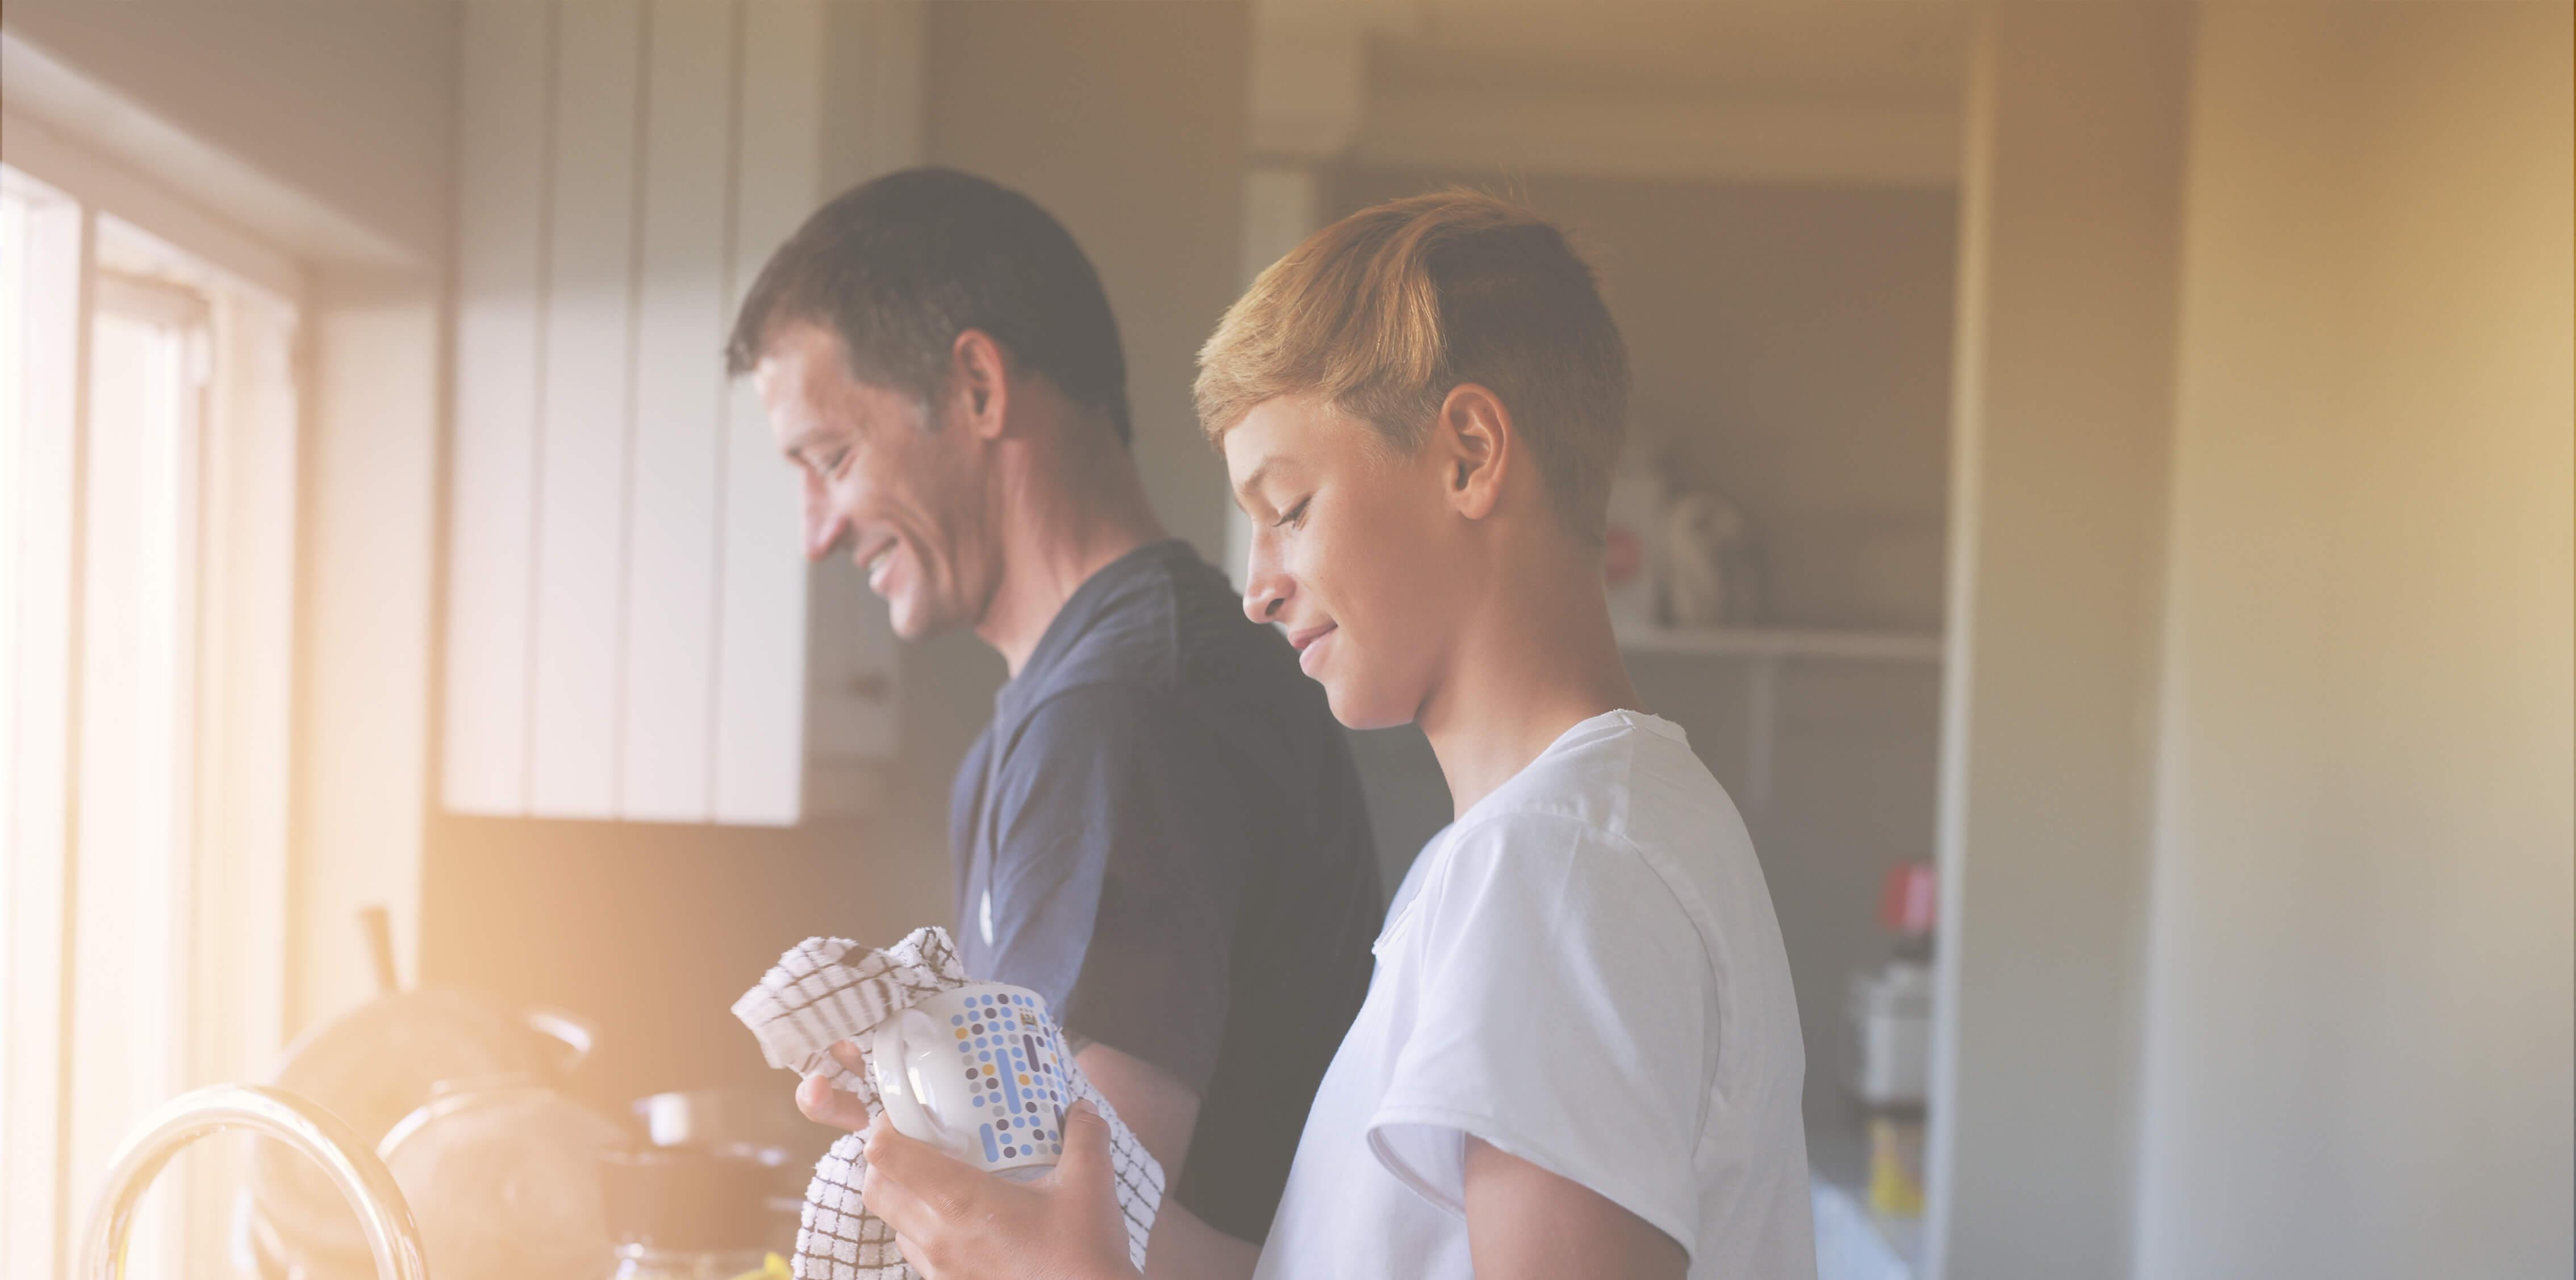 Familjehem i fokus hemsida om familjehem